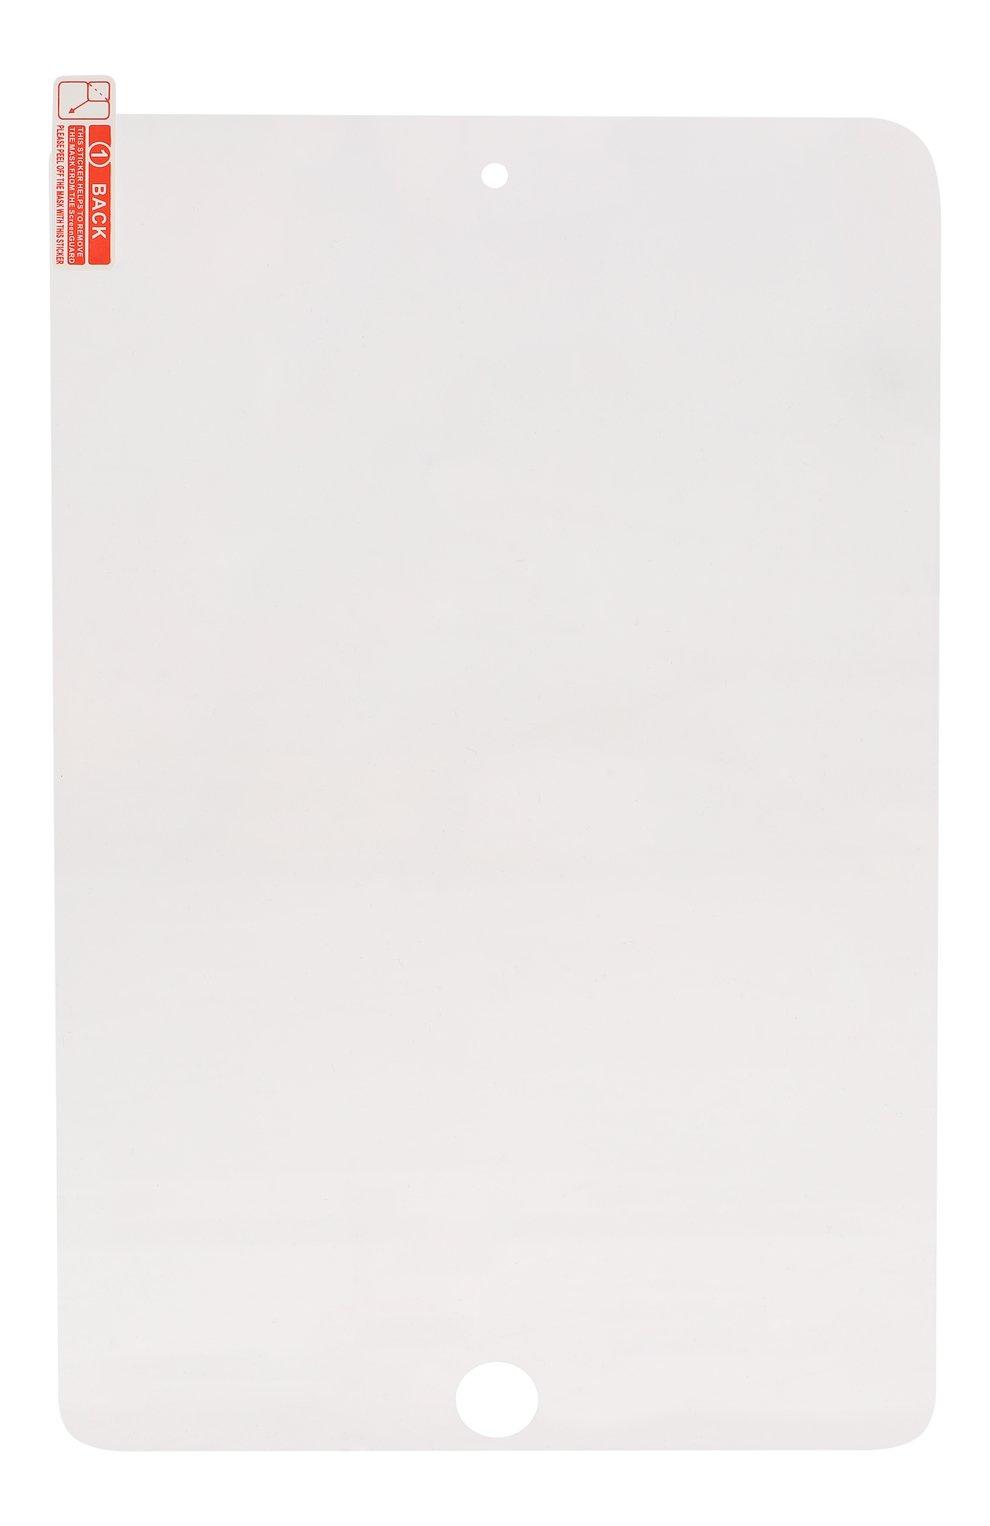 "Мужской защитное стекло premium glass screen protector для ipad mini 5/mini 4"" UBEAR прозрачного цвета, арт. GL63CL03F-IM | Фото 1"